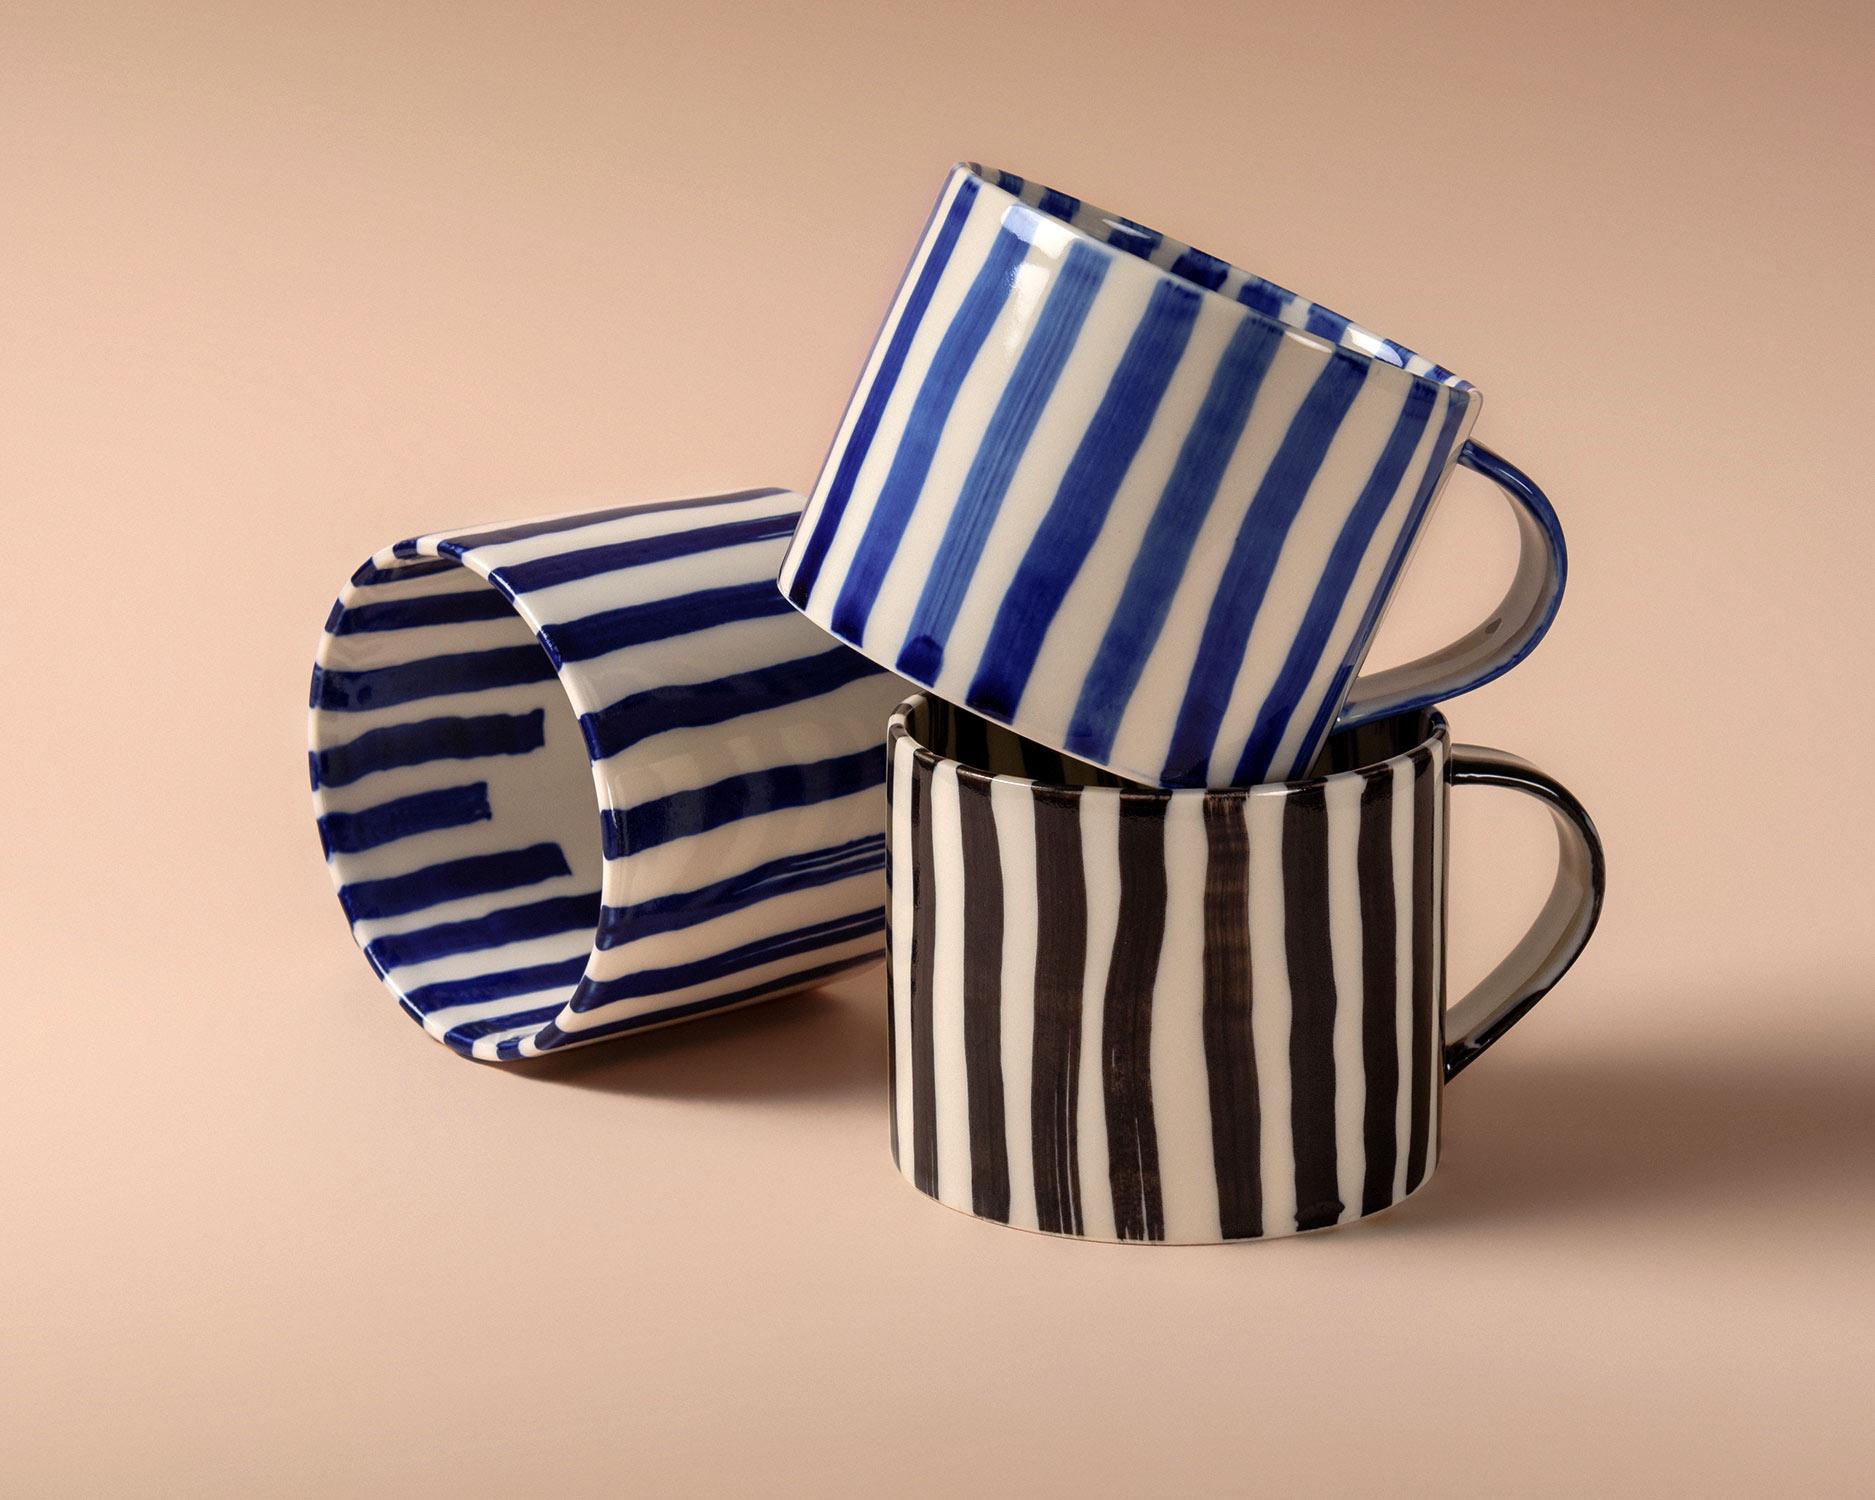 kalligrafi-tea-cup-pp-3.jpg